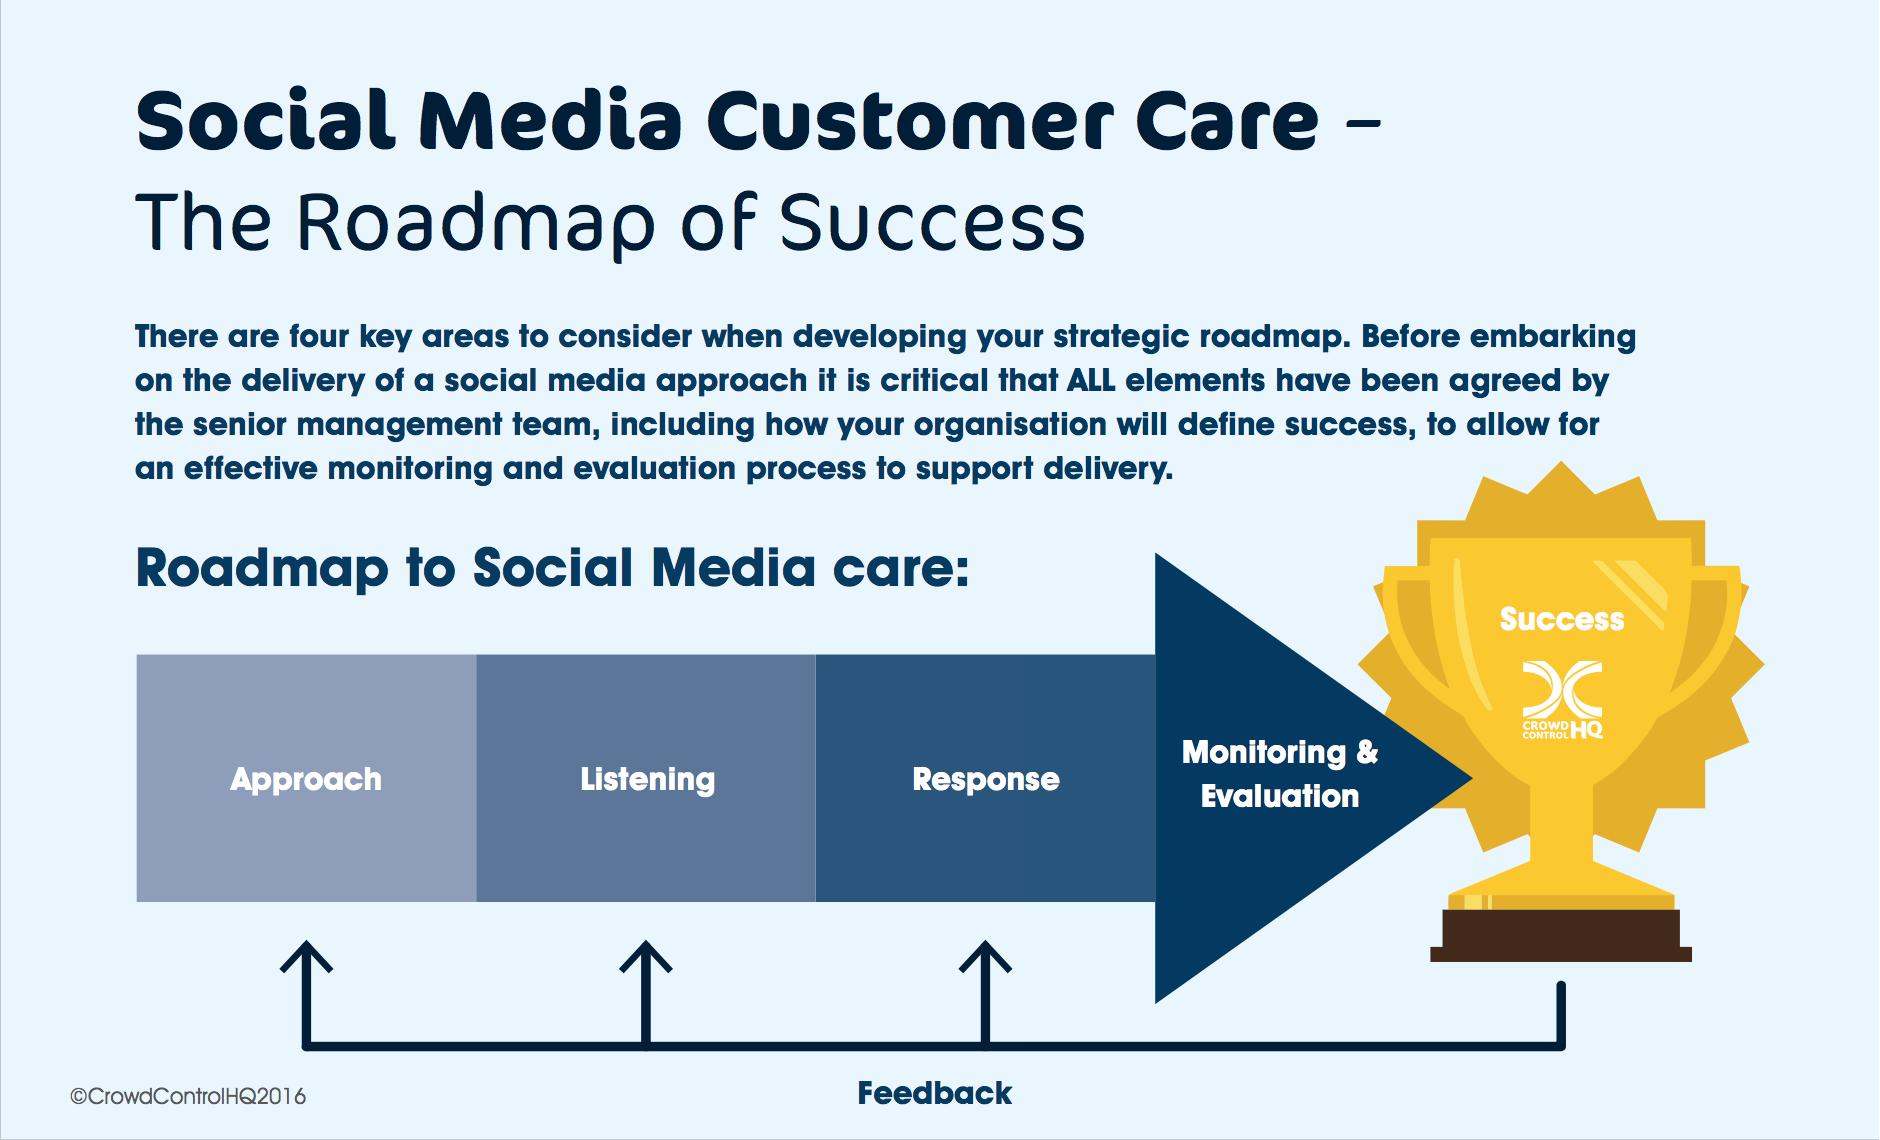 Social Media Customer Care, Roadmap of Success